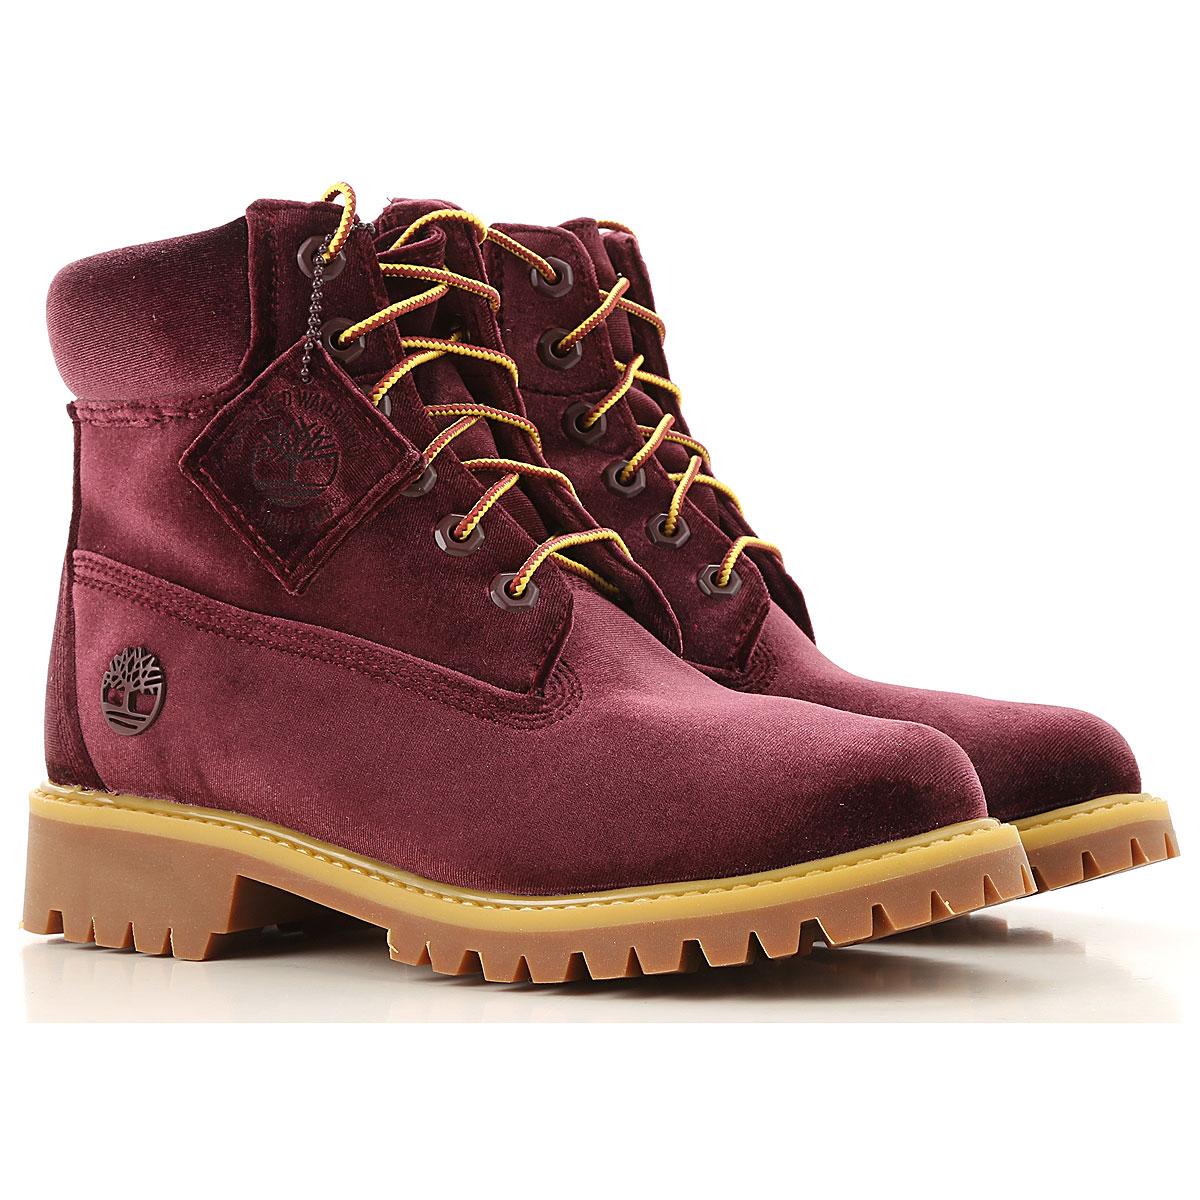 Off-White Virgil Abloh Boots for Women, Booties On Sale in Outlet, Burgundy, Velvet, 2019, US 7 (EU 38) US 9.5 (EU 40.5)